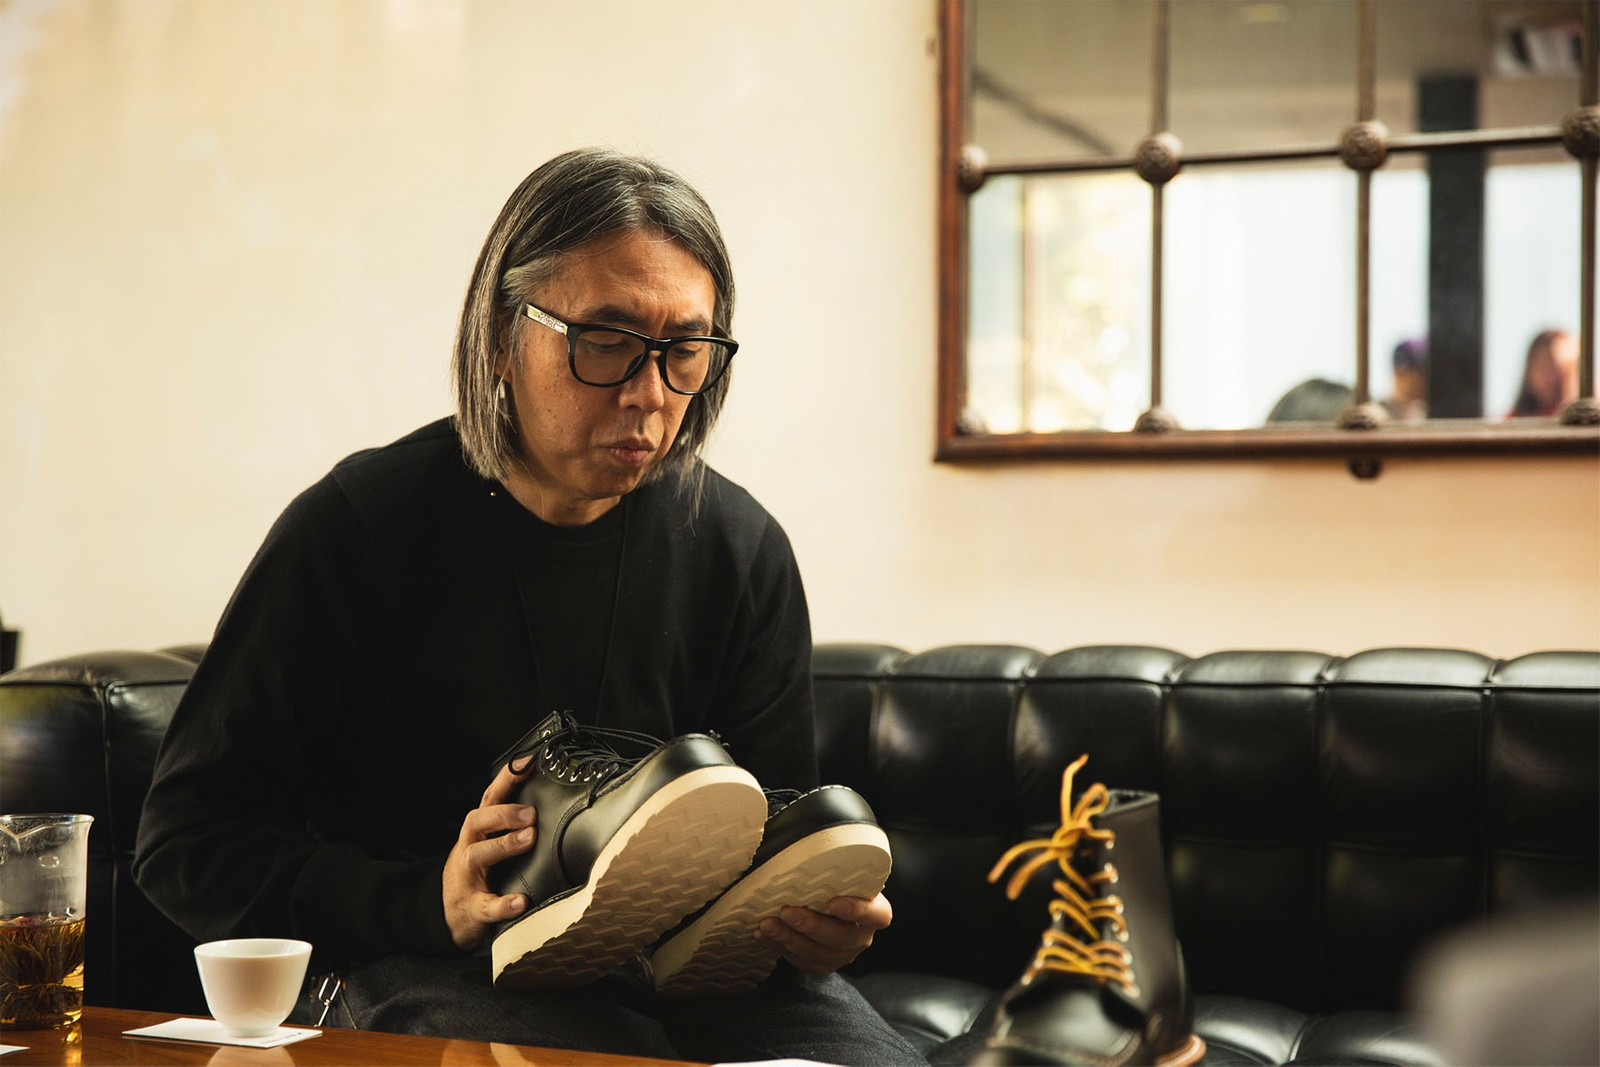 Interviews:藤原ヒロシが長年の愛用ブランド Red Wing と John Smedley とのコラボレーションについて語る レッド・ウィング ジョン スメドレー